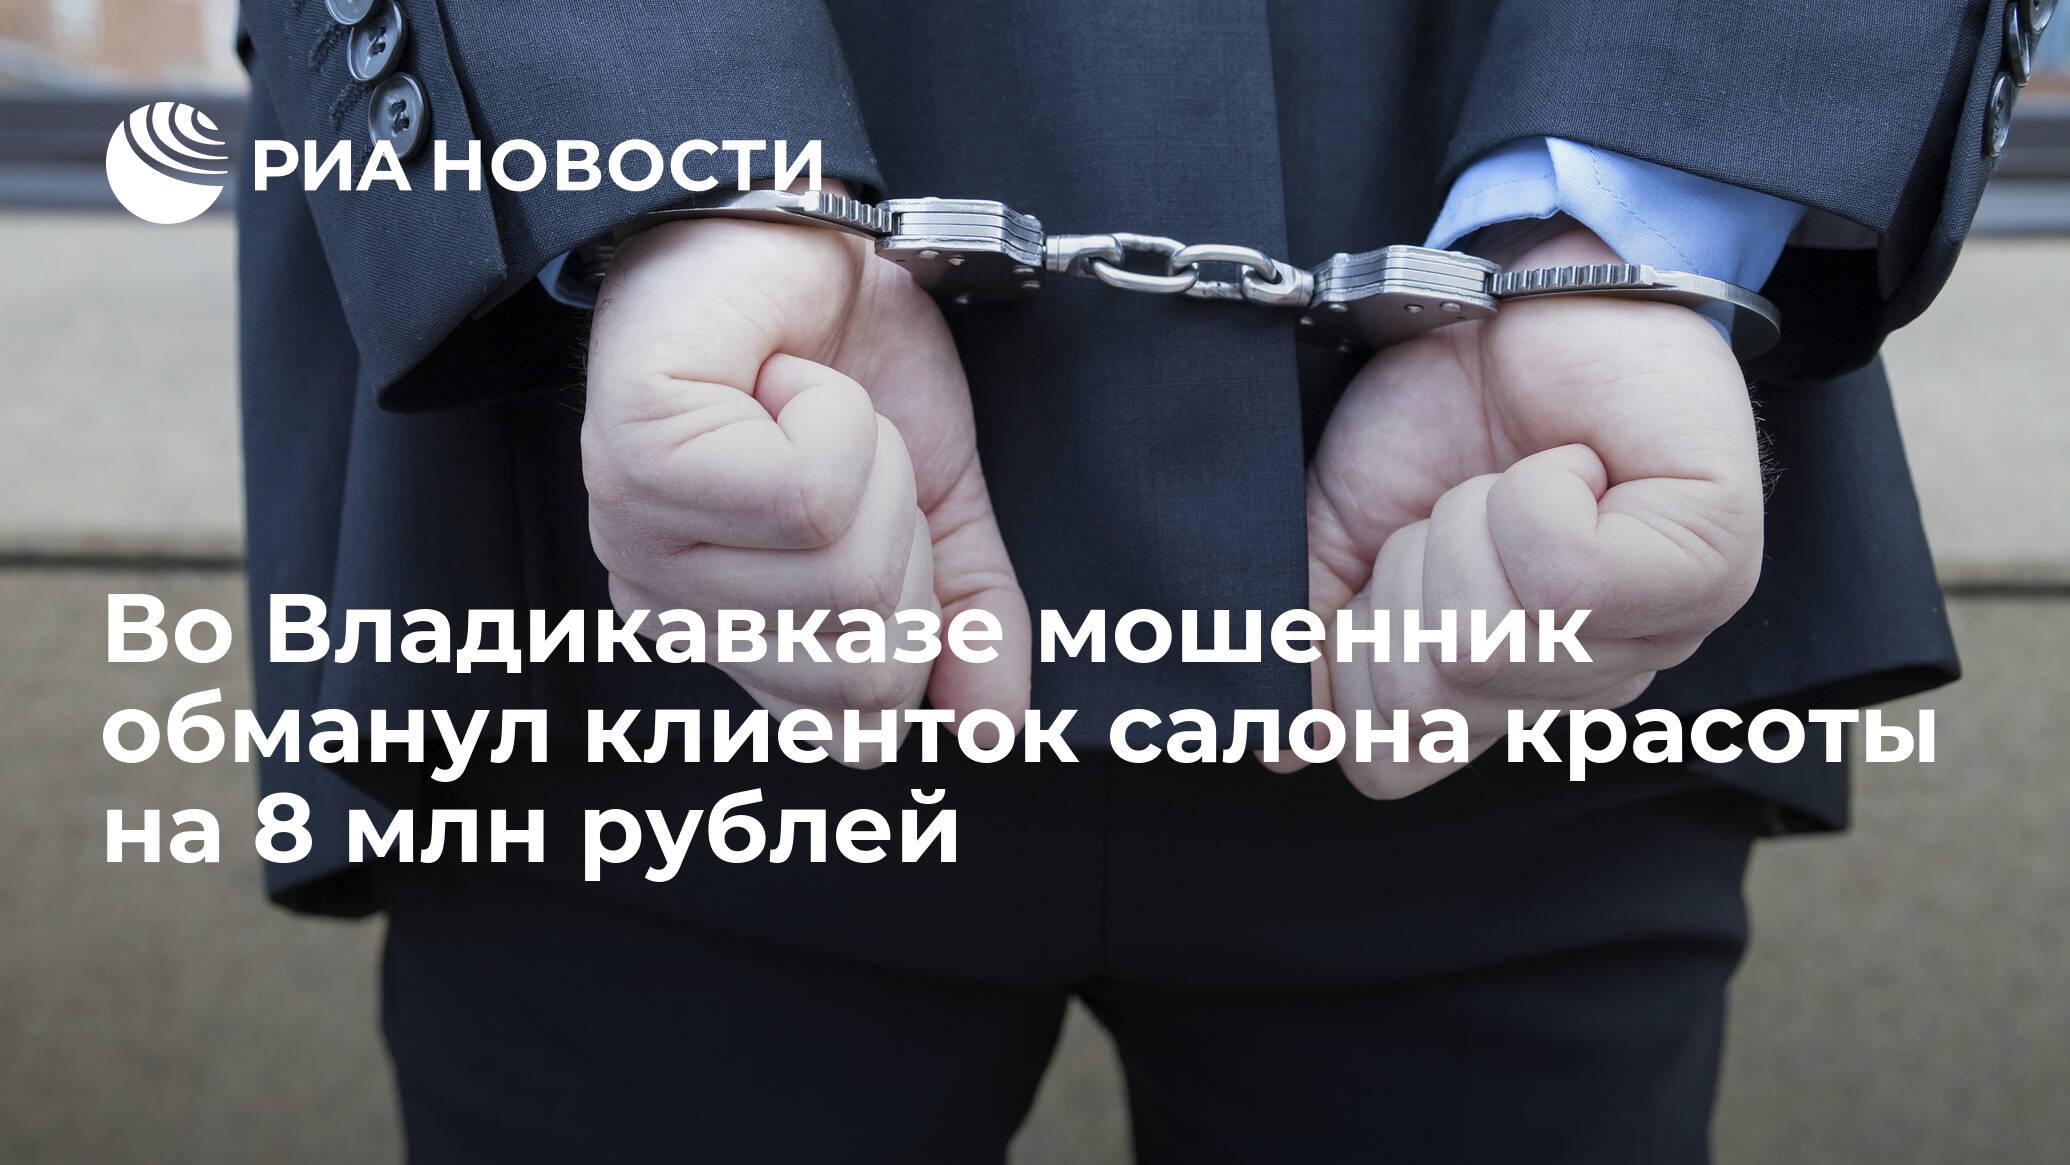 кредит по паспорту владикавказ